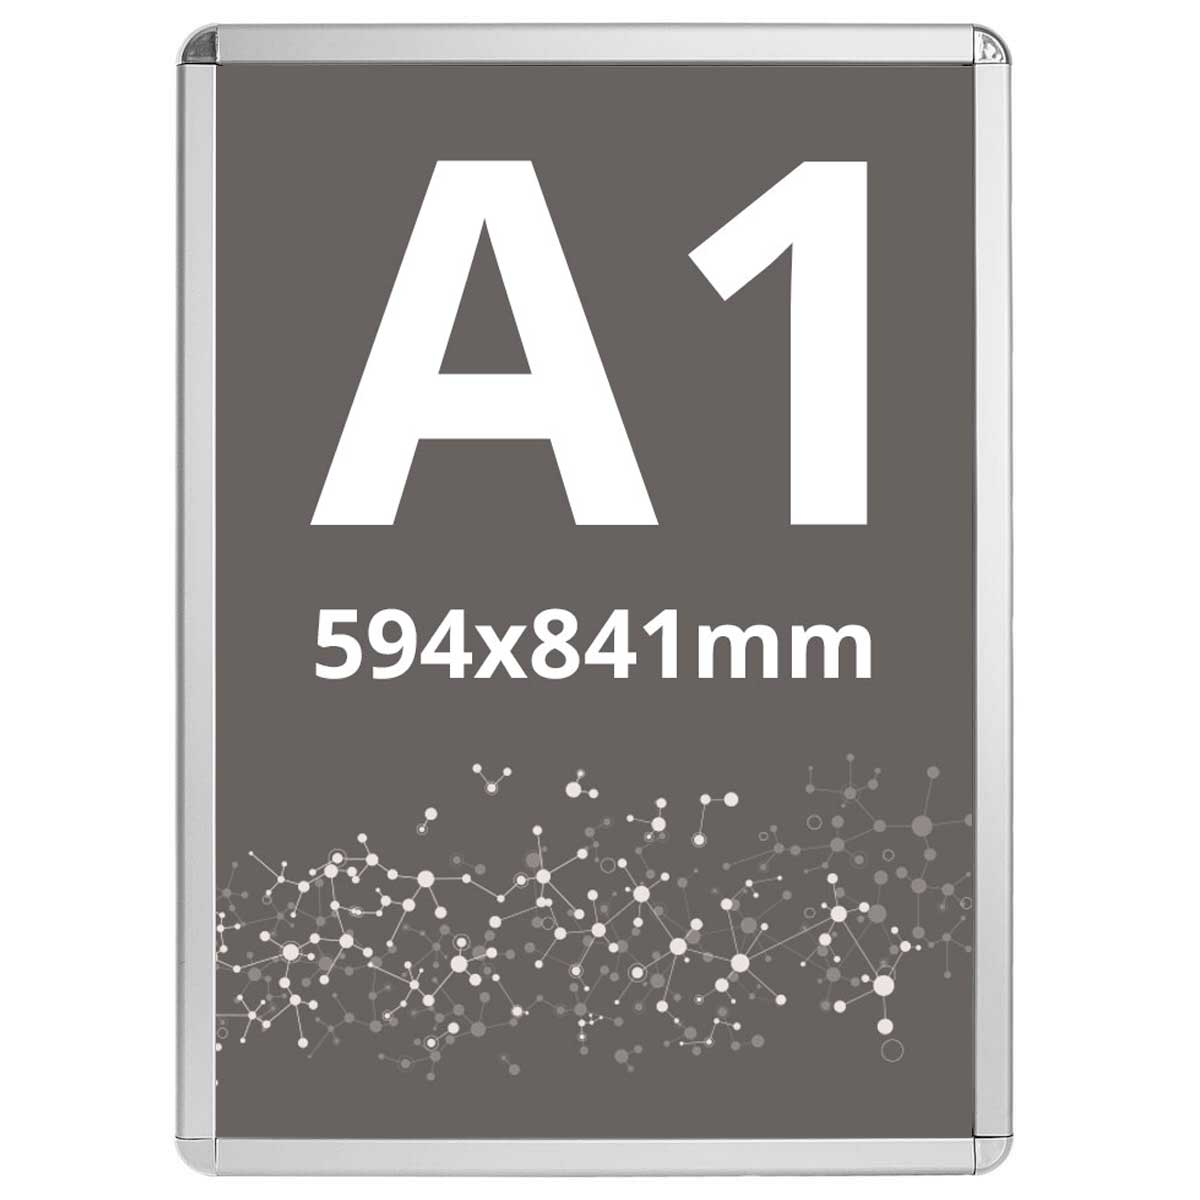 Ramă click Poster Frame din aluminiu 32, colțuri rotunde A1, JJ DISPLAYS, 594 x 841 mm